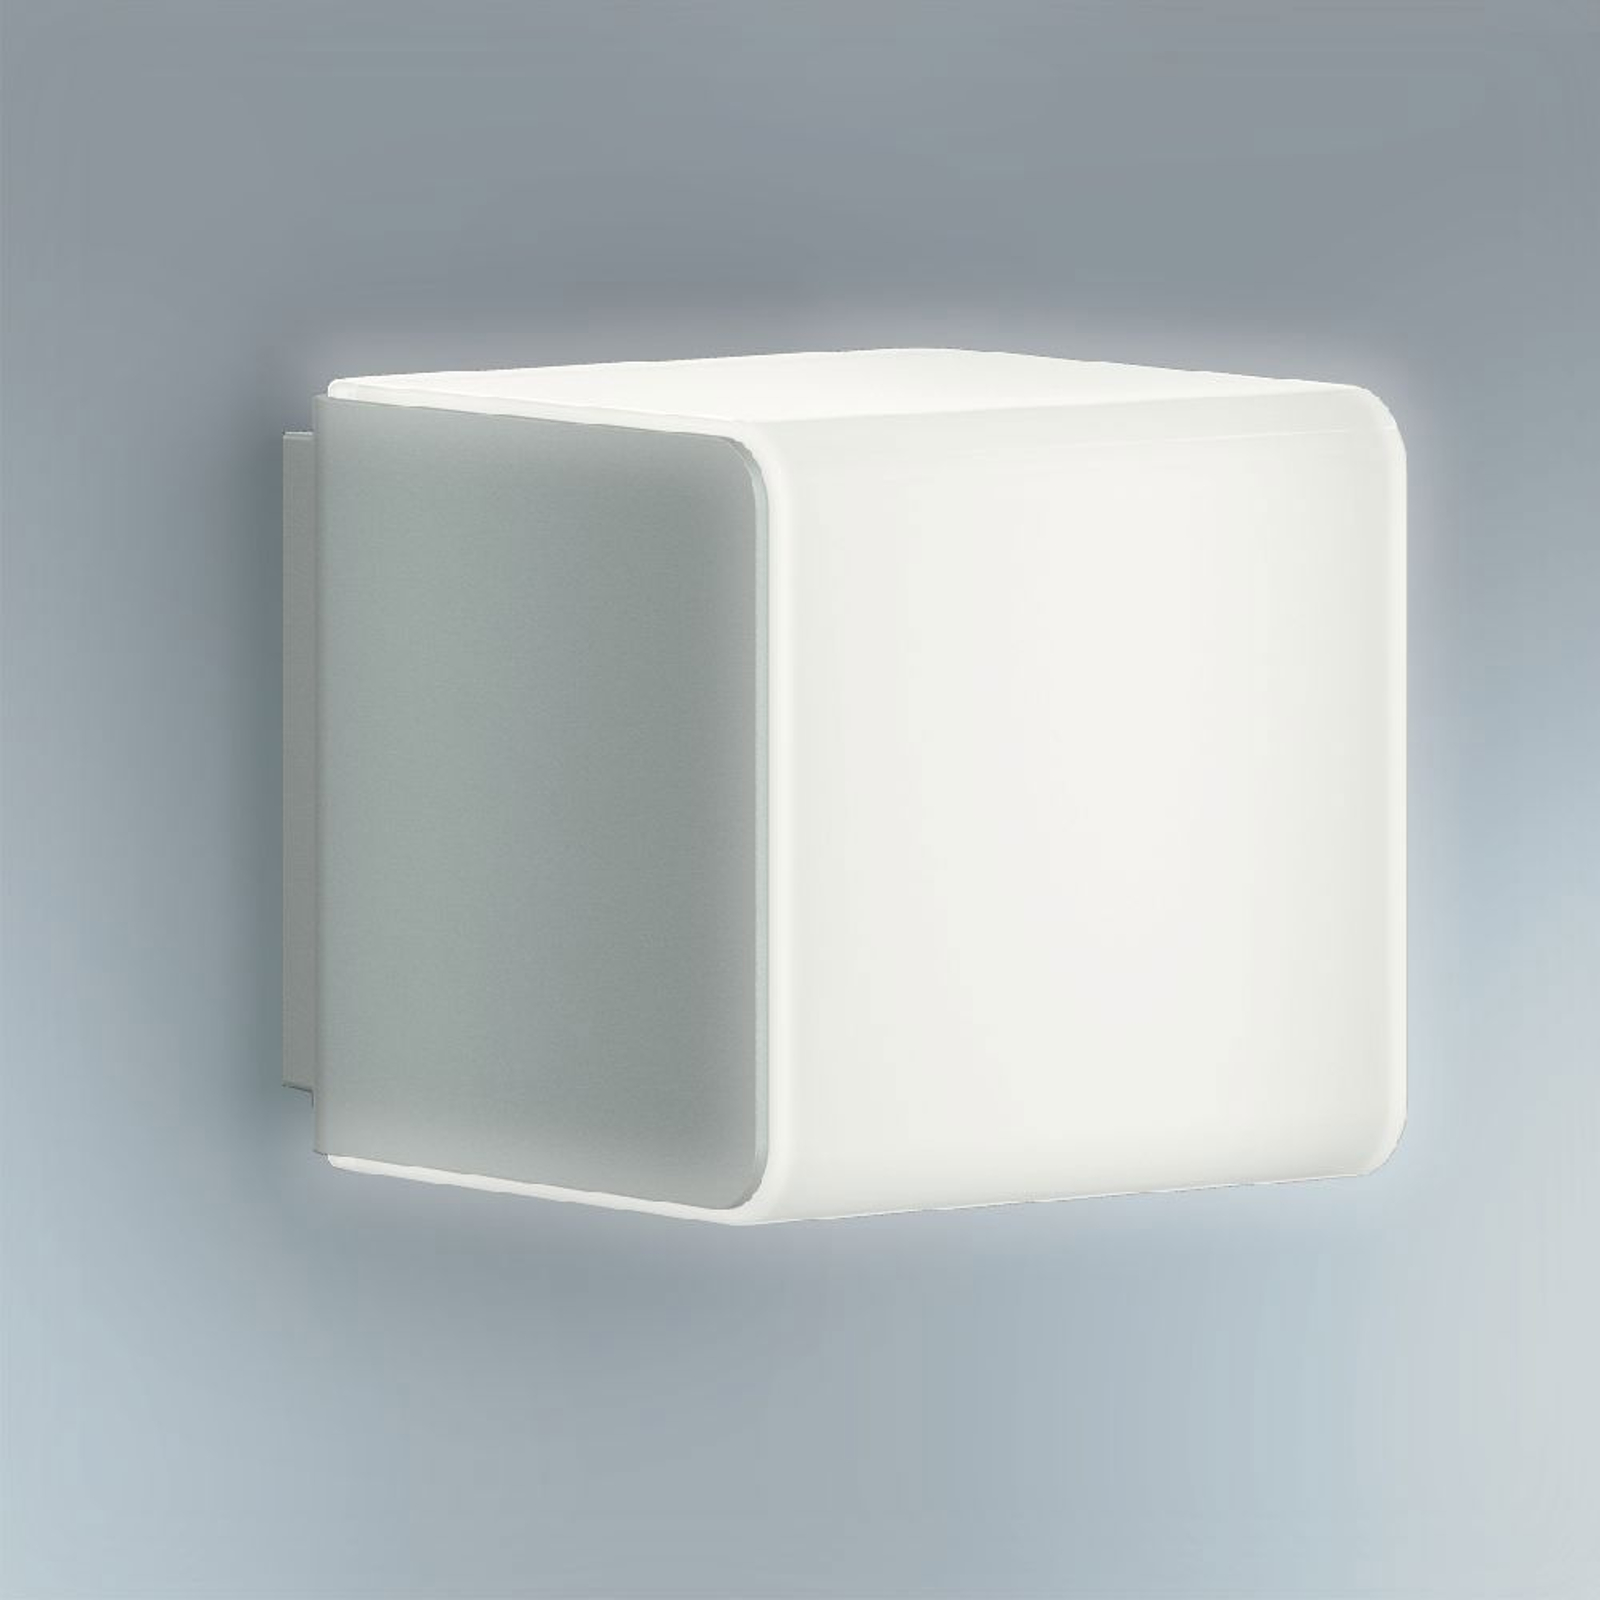 STEINEL L 830 iHF aplique de exterior, plata